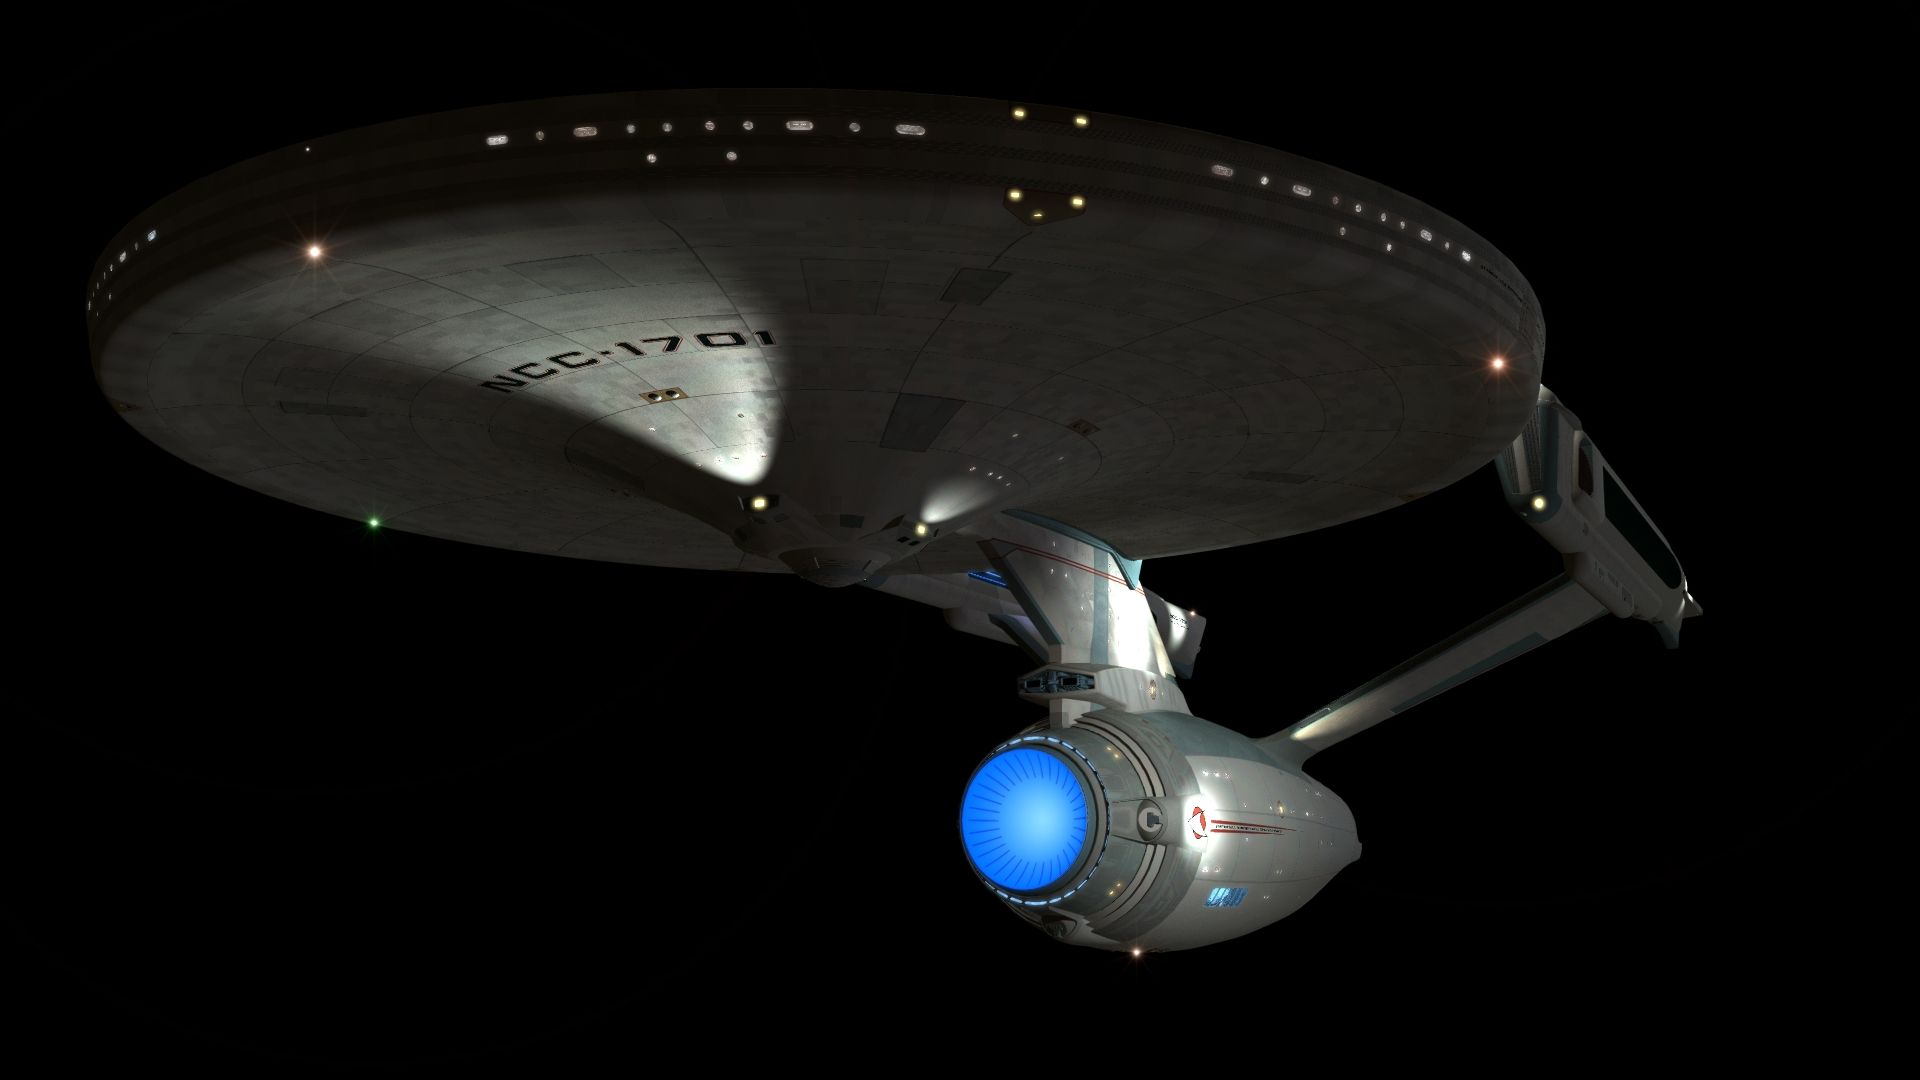 star trek – enterprise 1701-a wallpaper.jpg